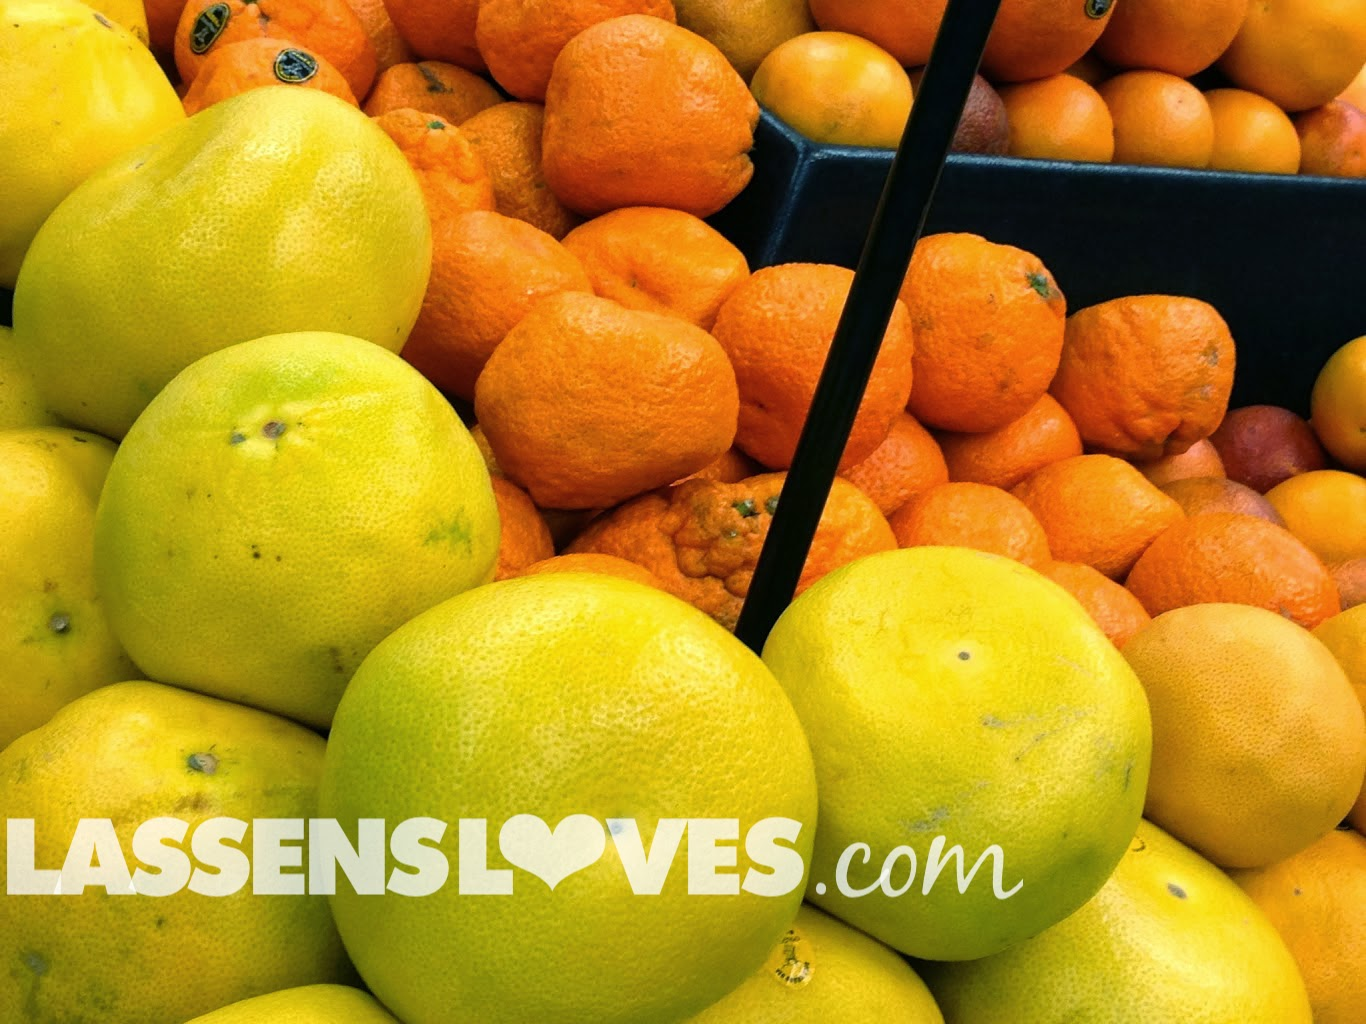 Thousand+Oaks, Organic+Produce